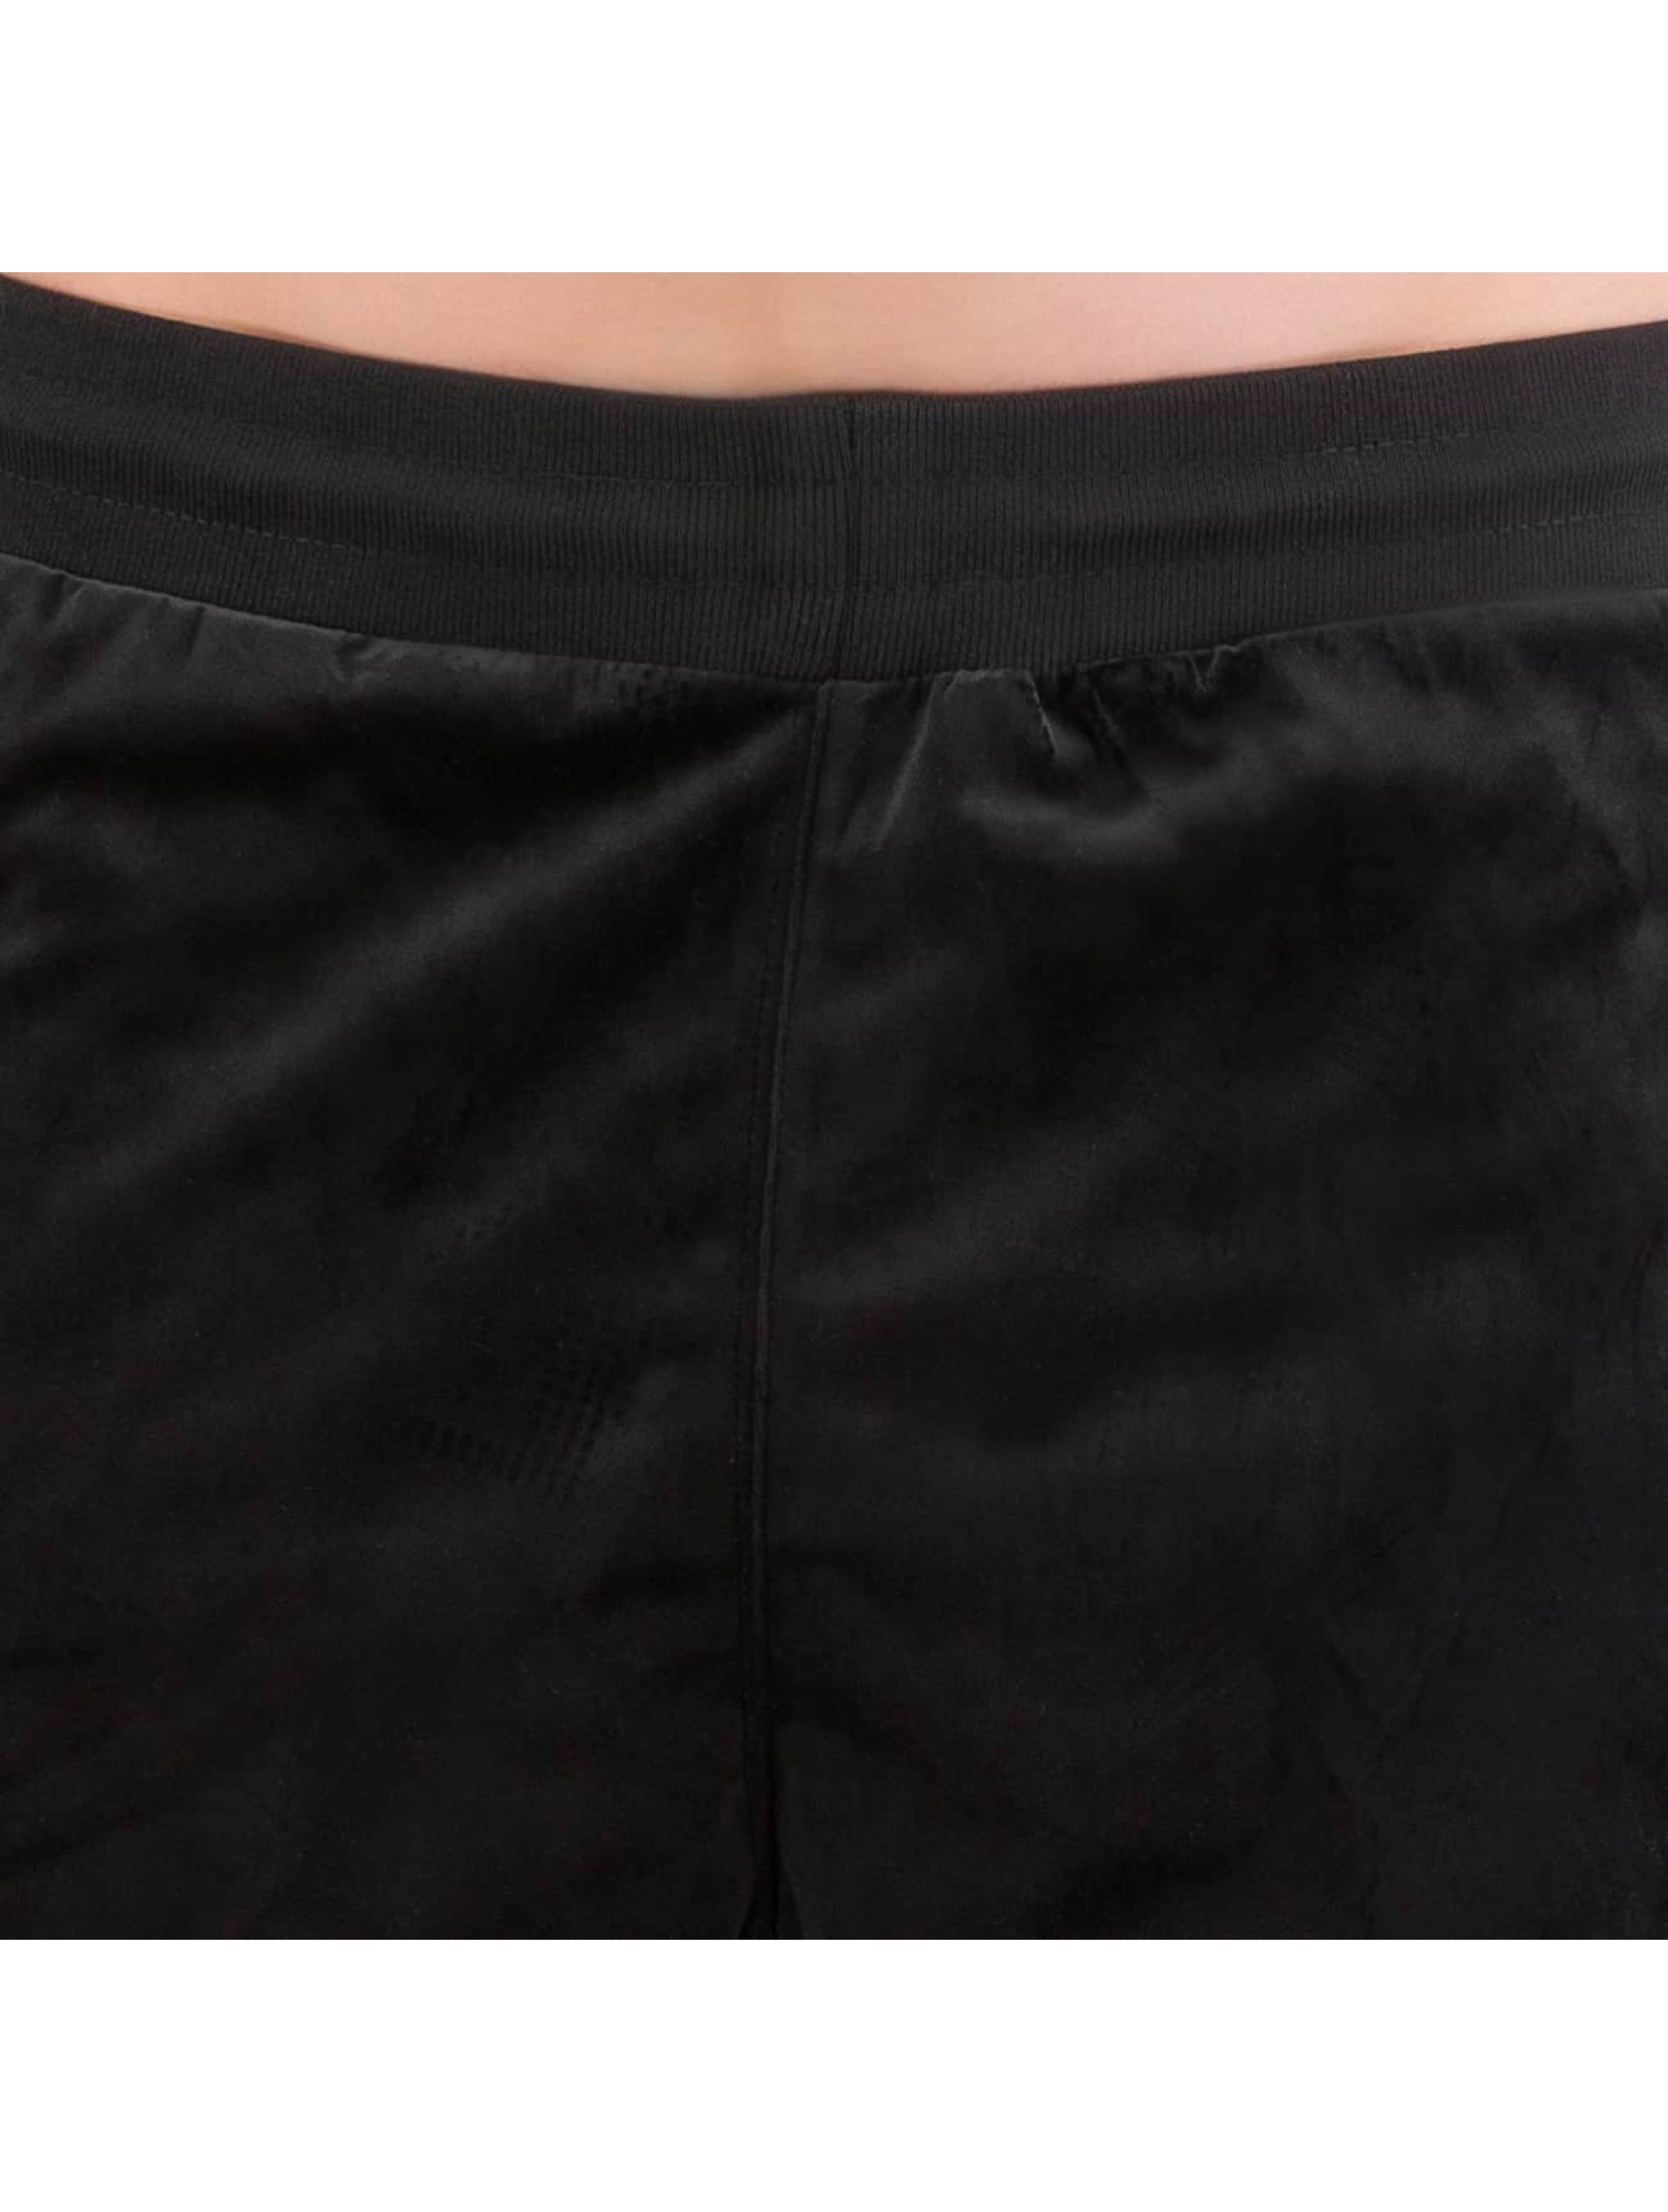 CHABOS IIVII joggingbroek Core Velour Samt zwart